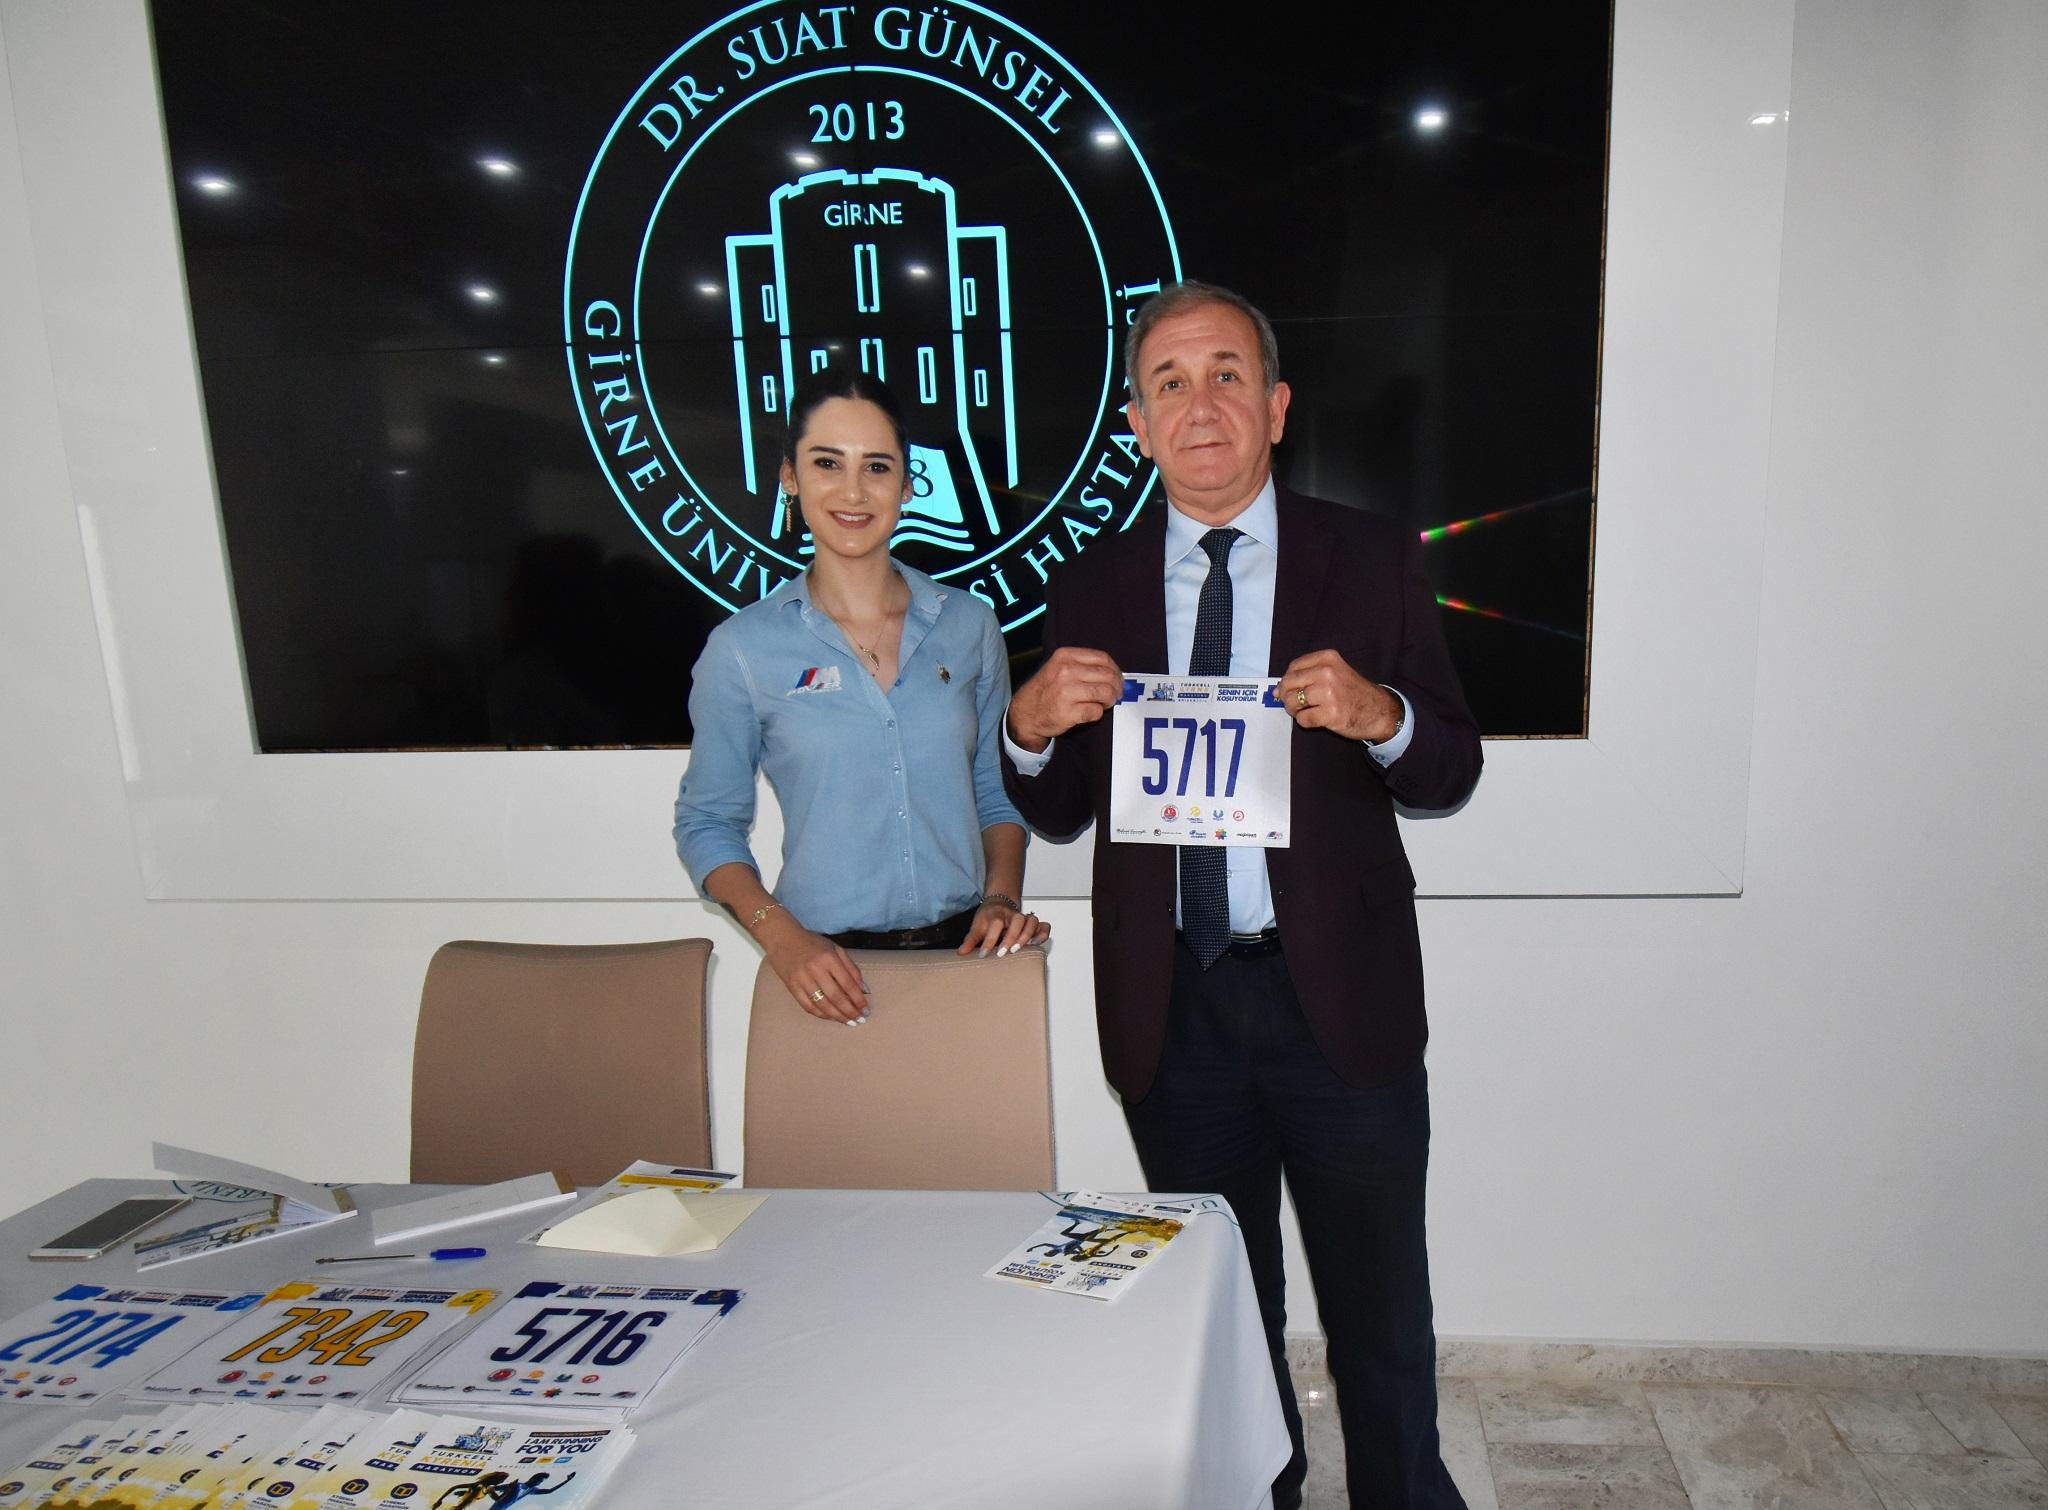 1.Girne Maratonu'na Destek Sponsoru